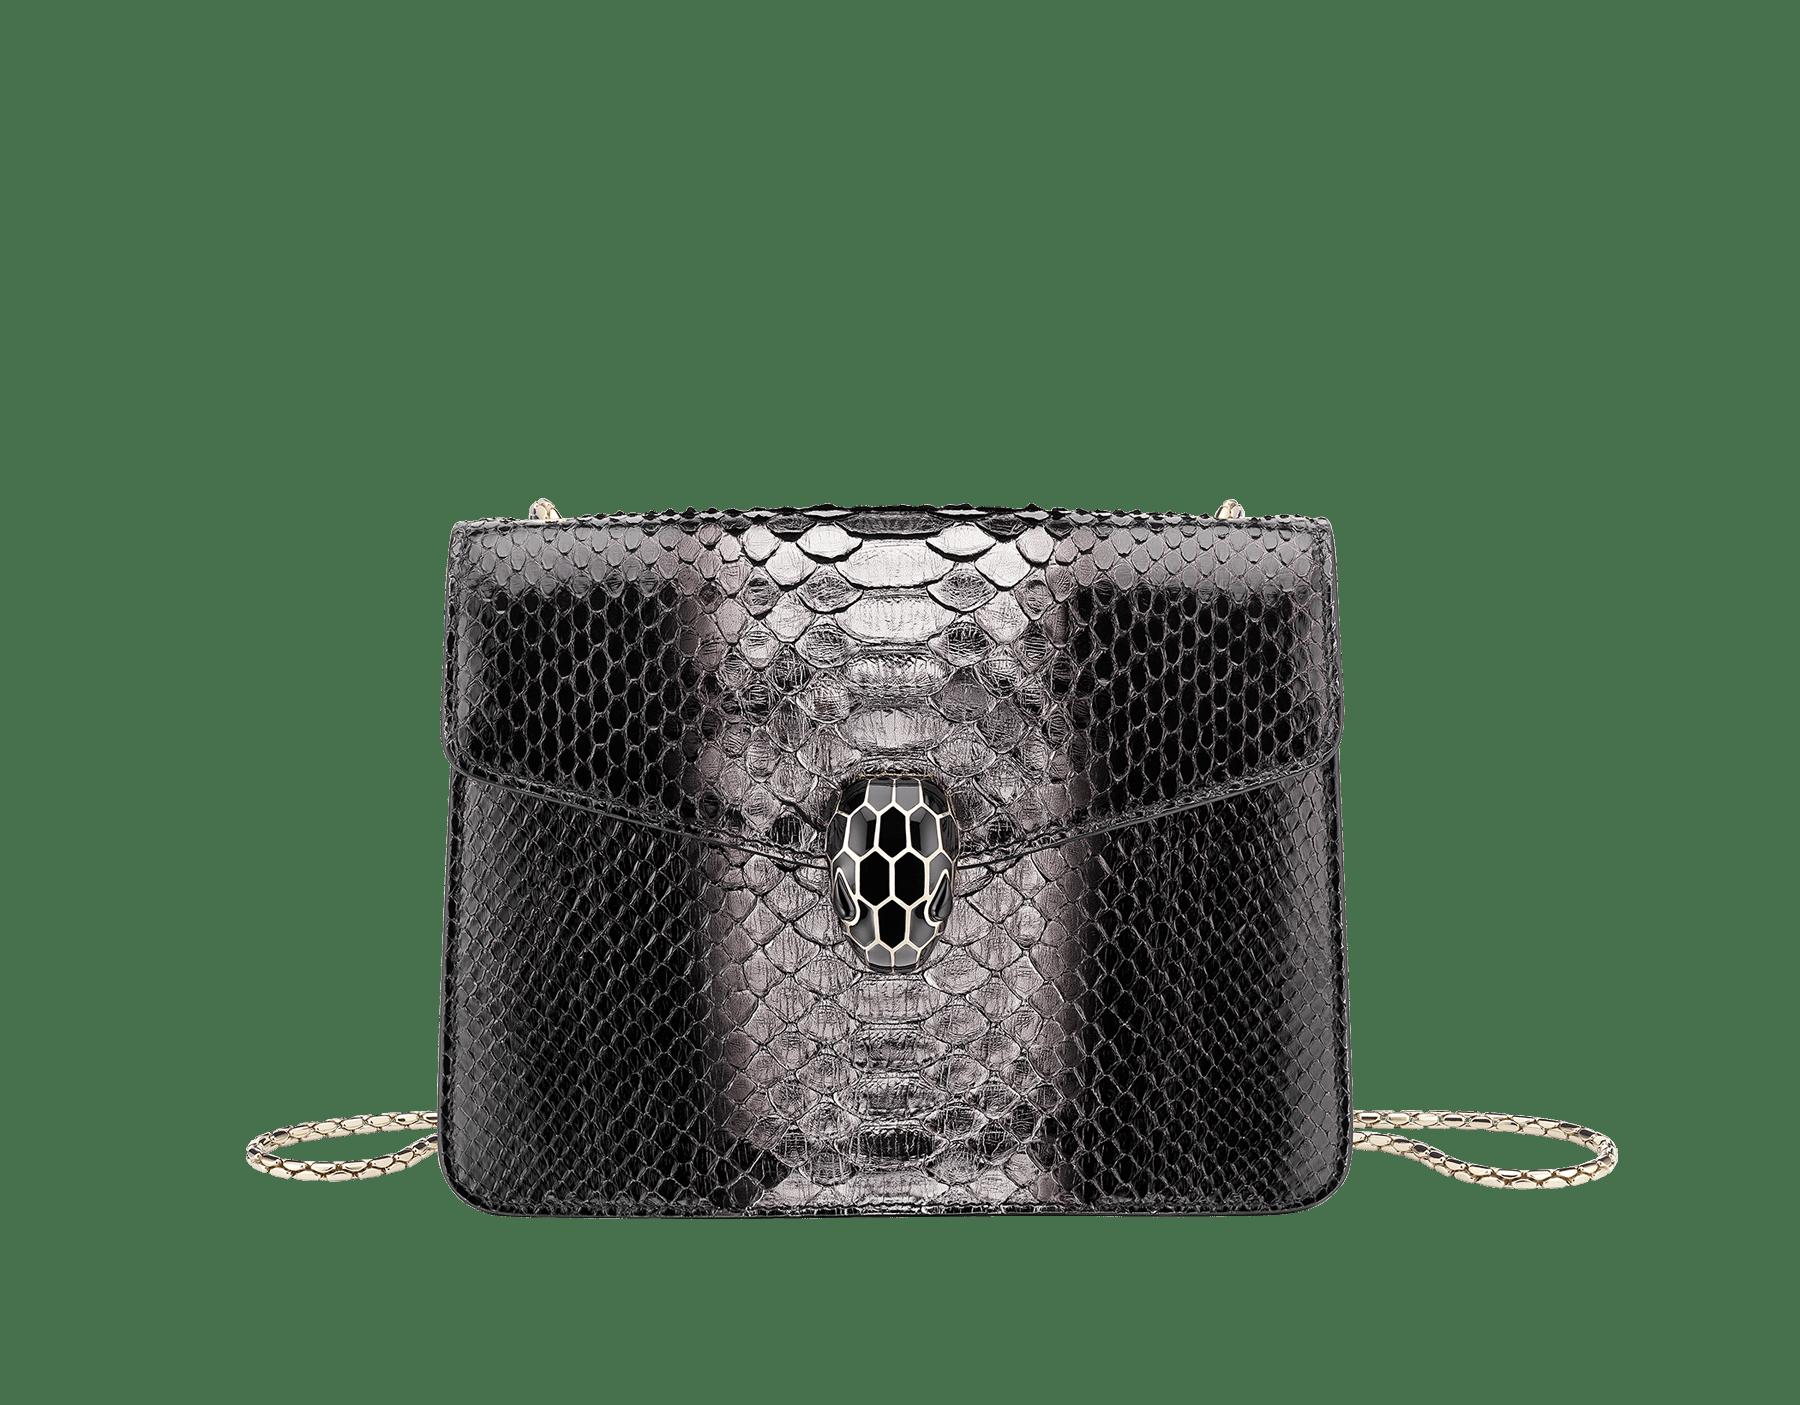 Serpenti Forever 斜背包採用黑色和銀色光影蟒皮。淡金色黃銅蛇頭扣環飾以黑色琺瑯,蛇眼鑲飾黑色縞瑪瑙。 288108 image 1